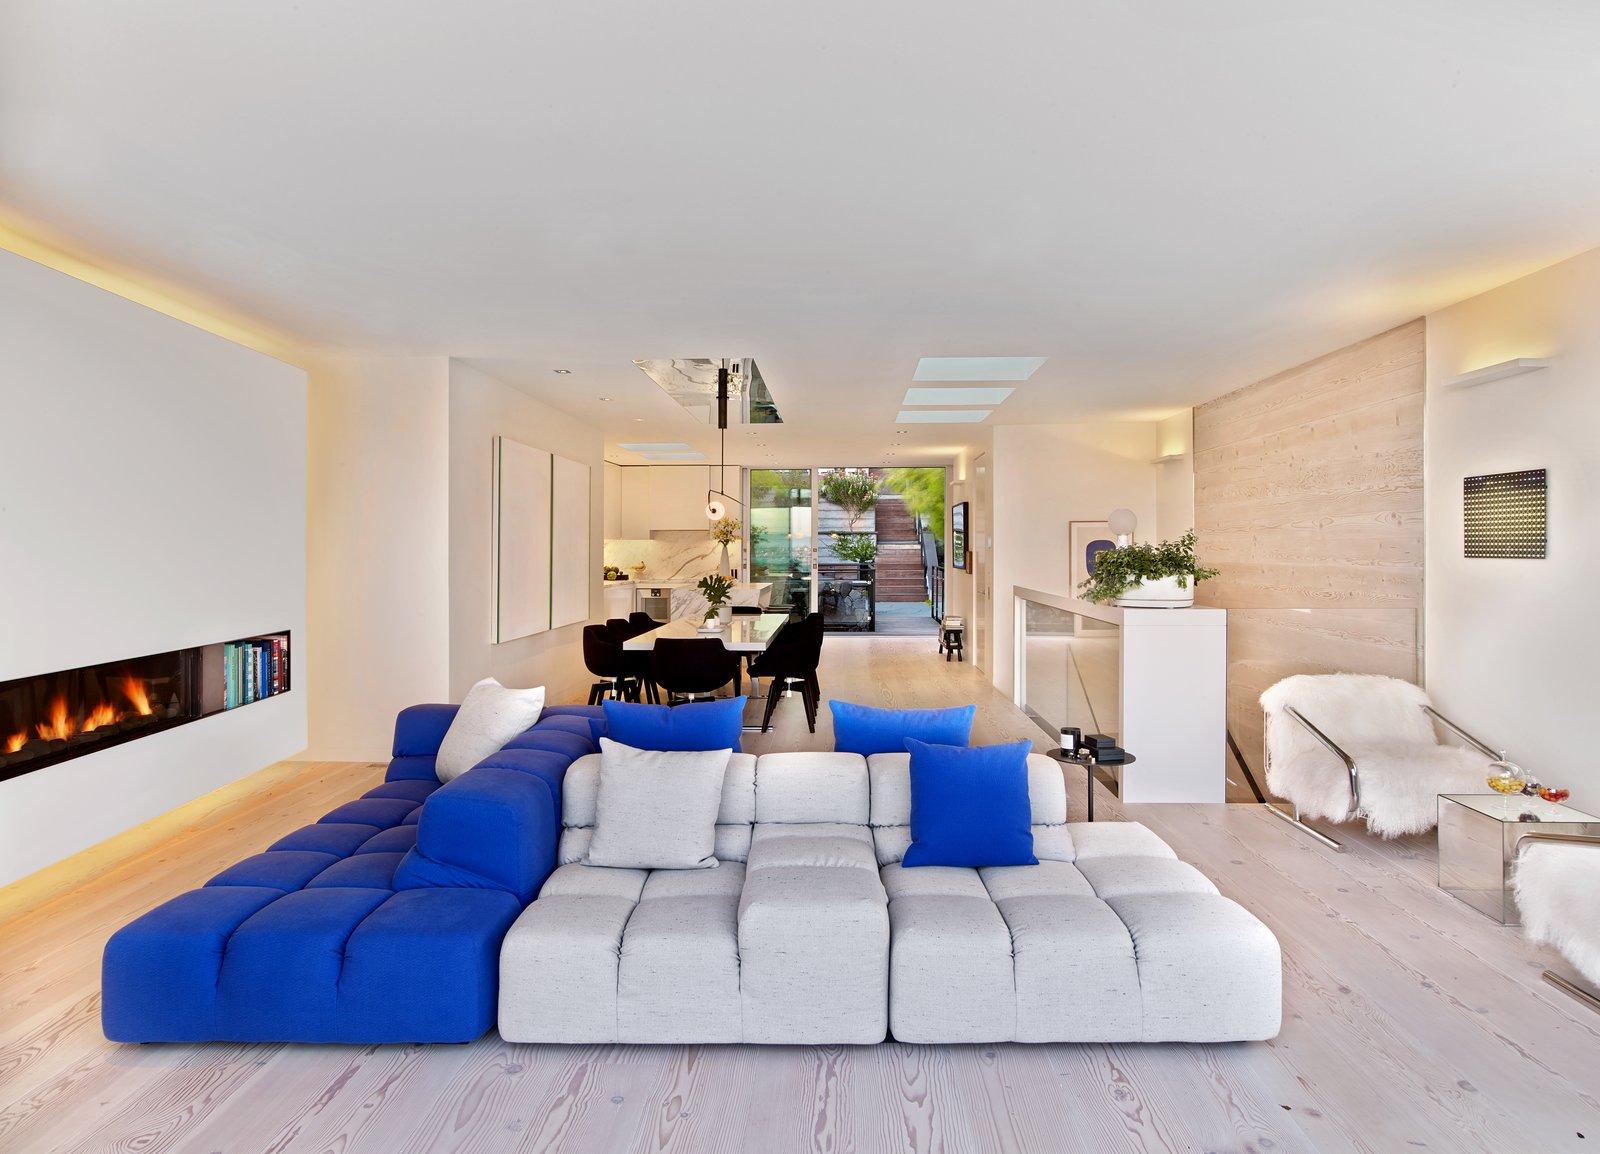 Glen Park Residence by CCS Architecture